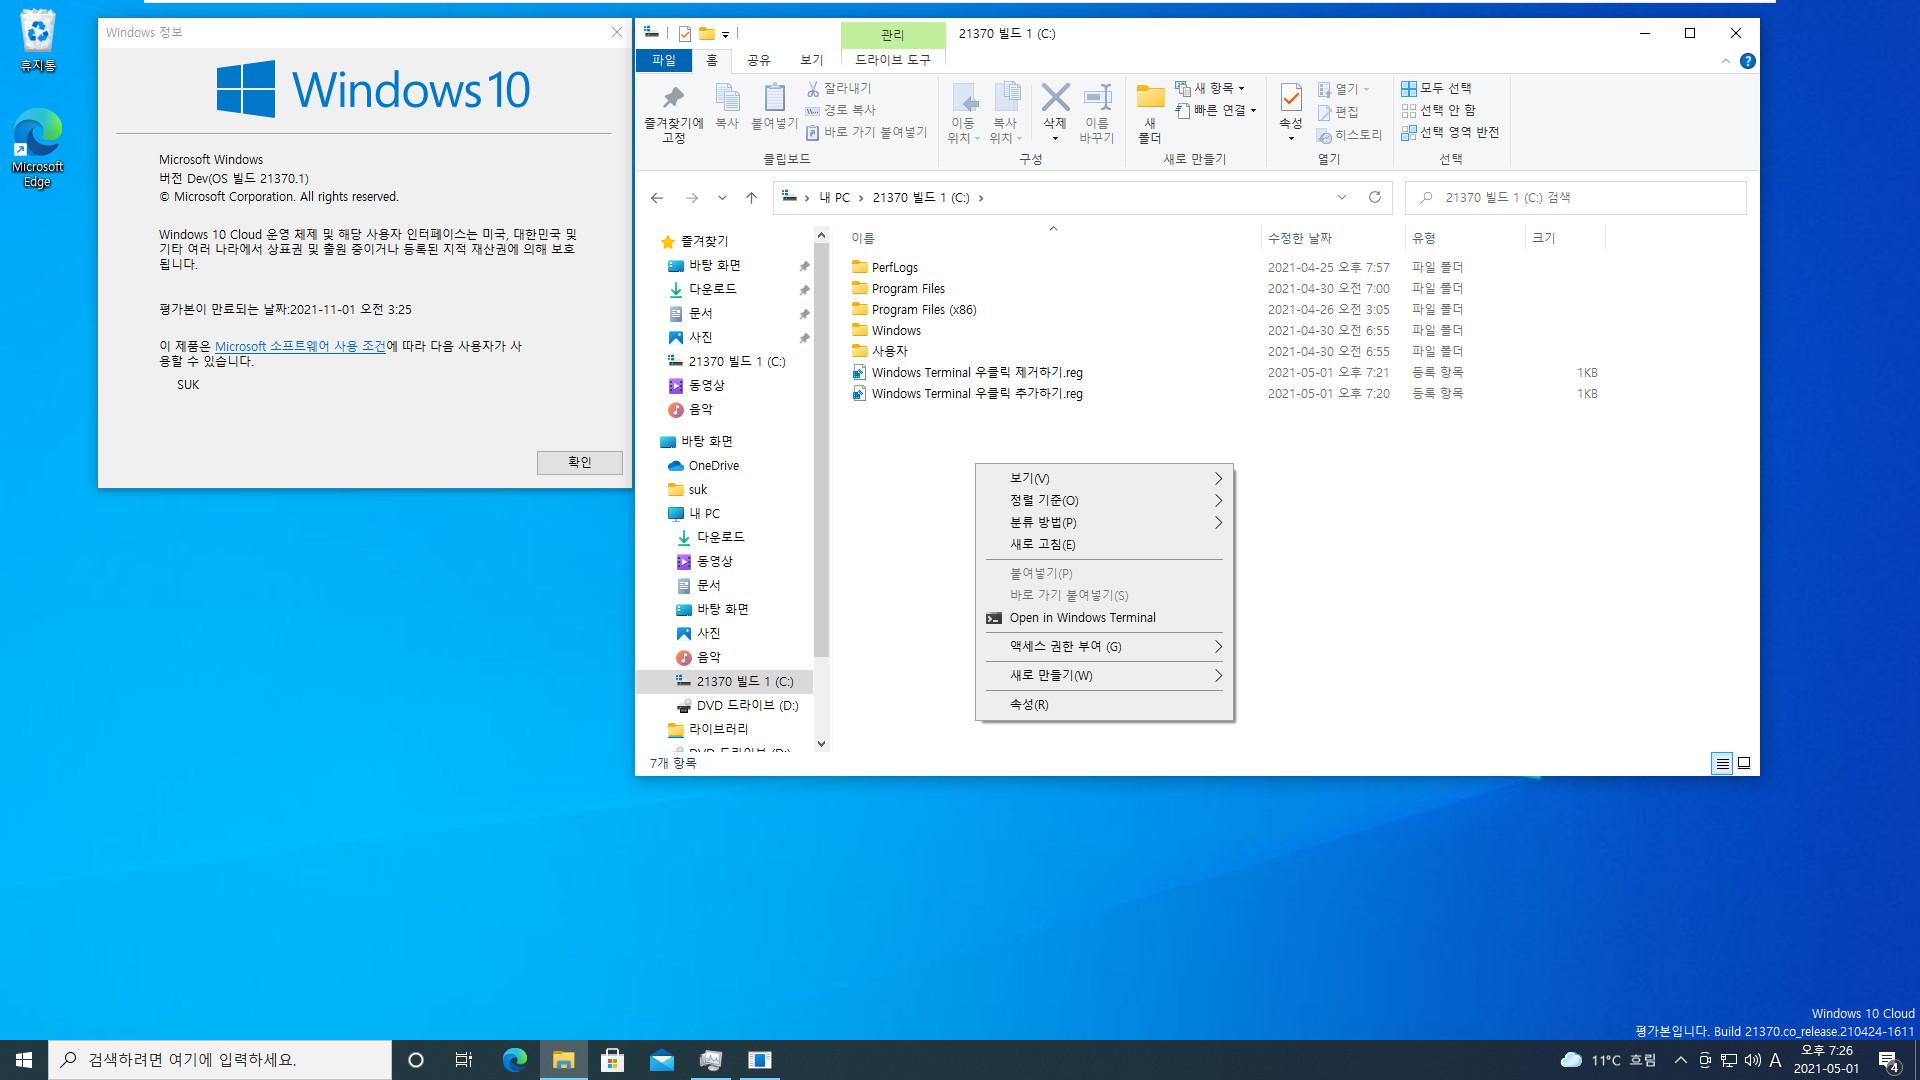 Windows Terminal 우클릭 제거하기.reg와 Windows Terminal 우클릭 추가하기.reg 테스트 2021-05-01_192606.jpg